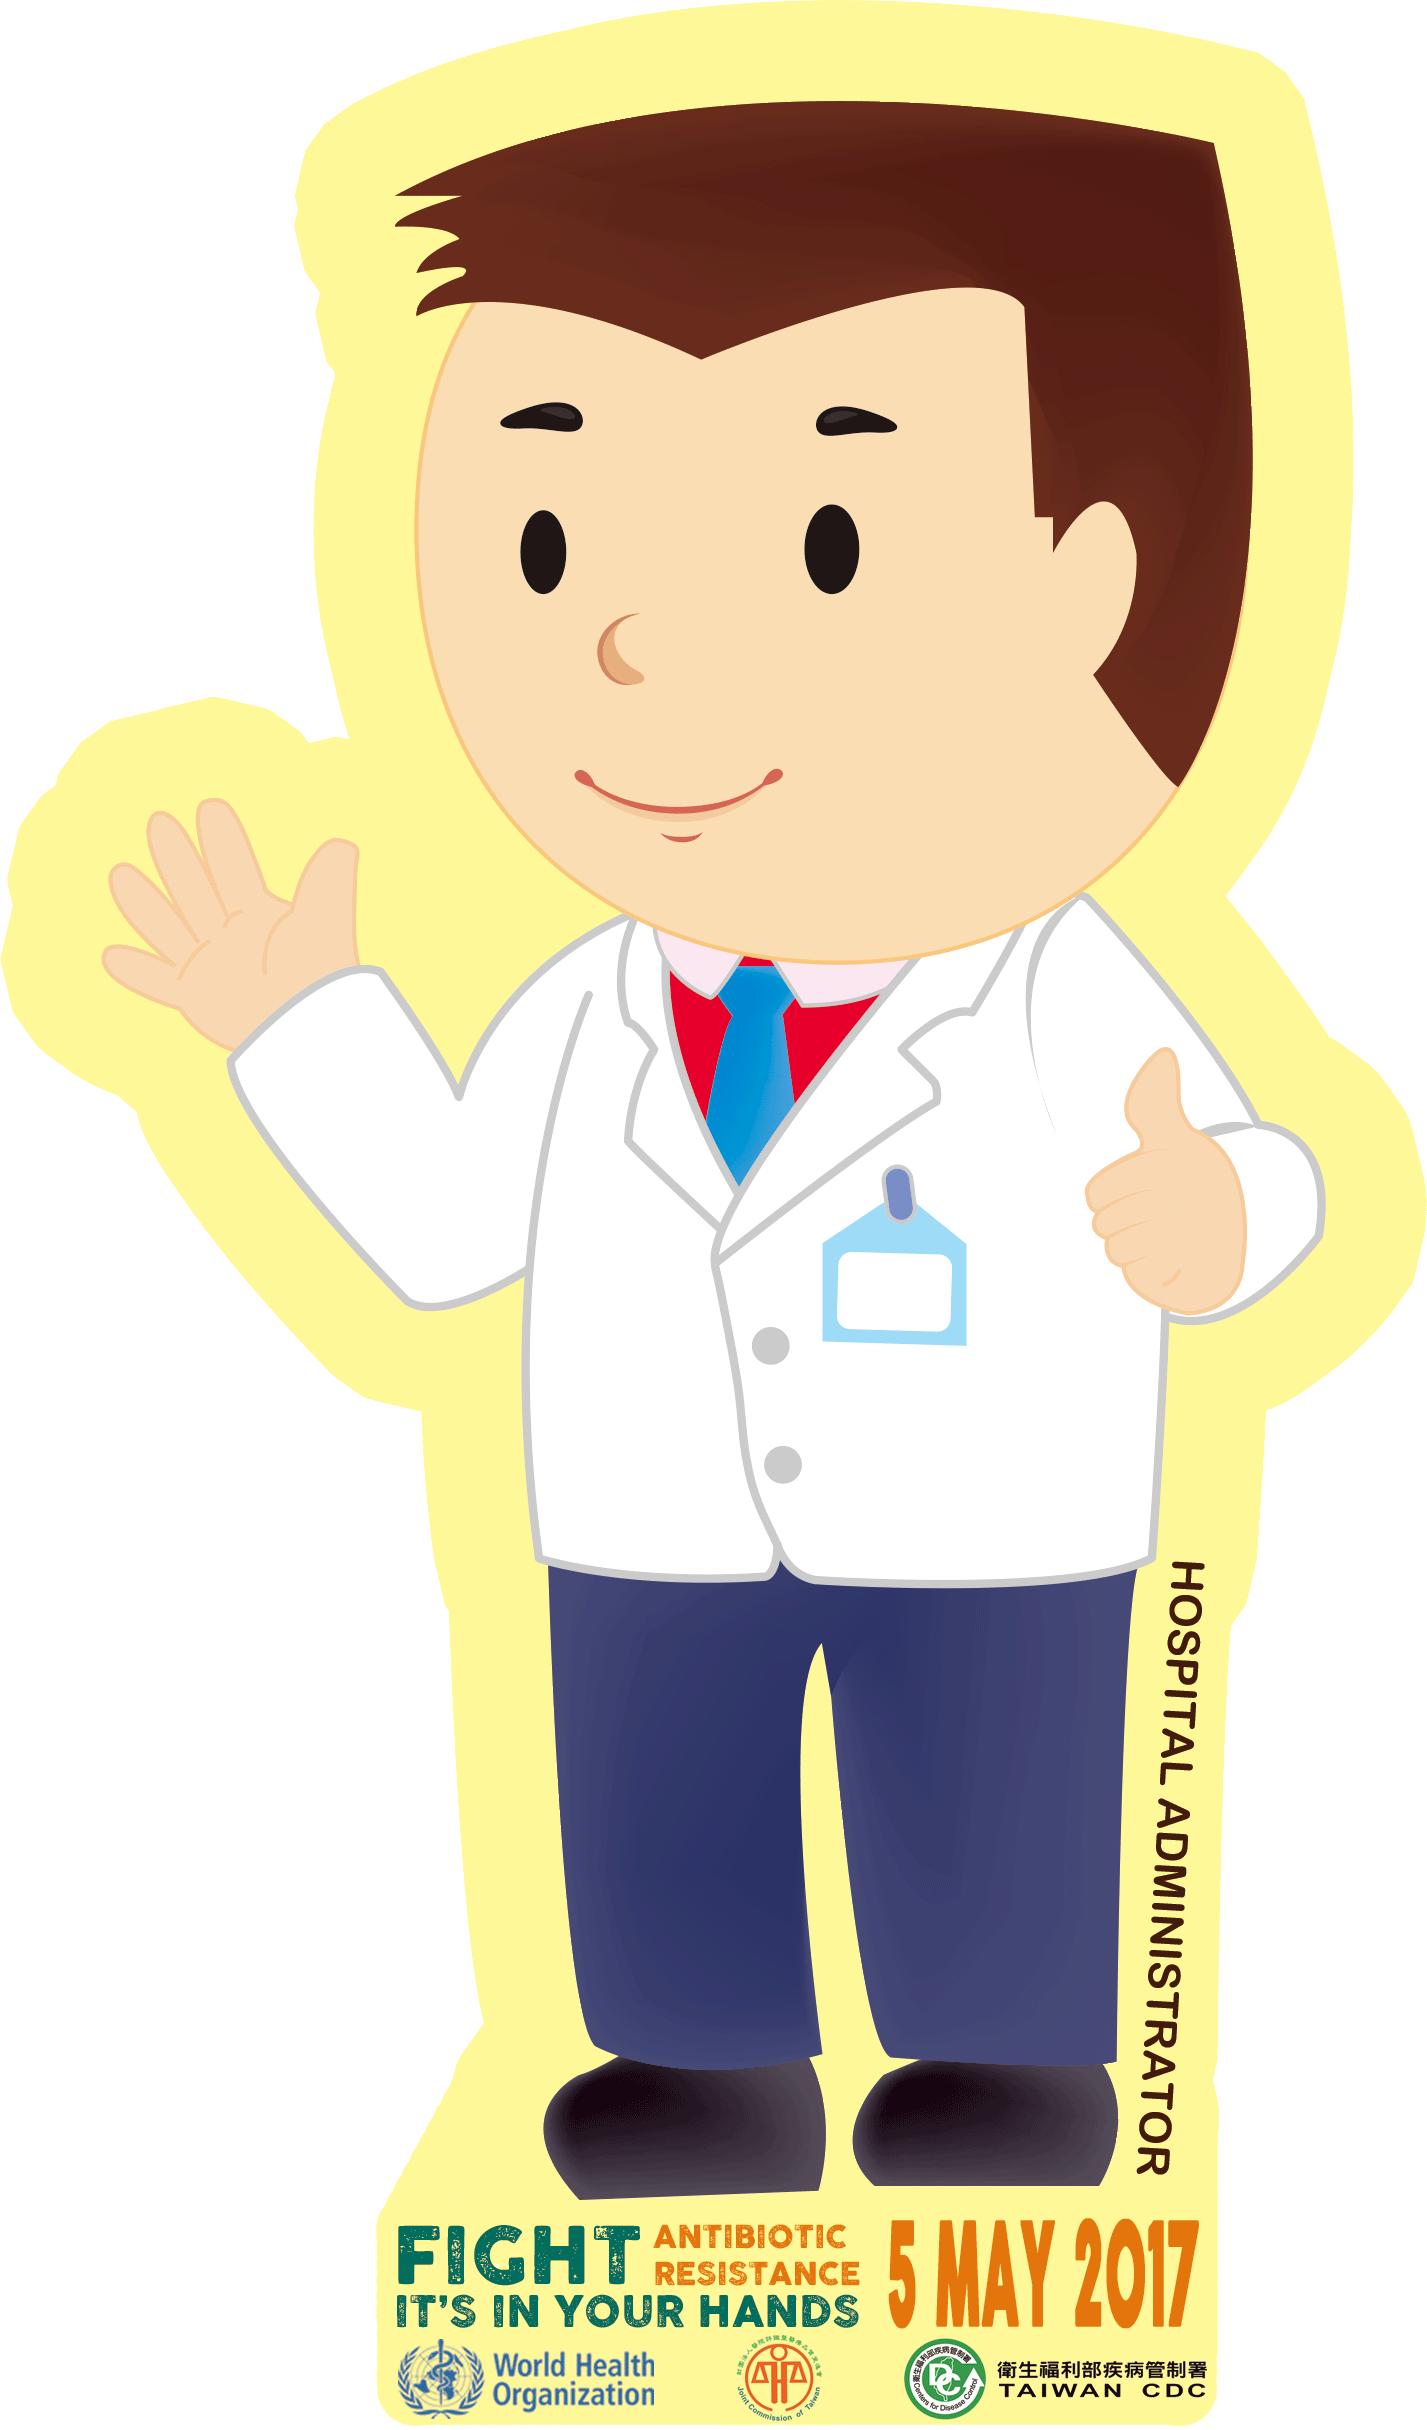 Q版娃娃-醫院主管